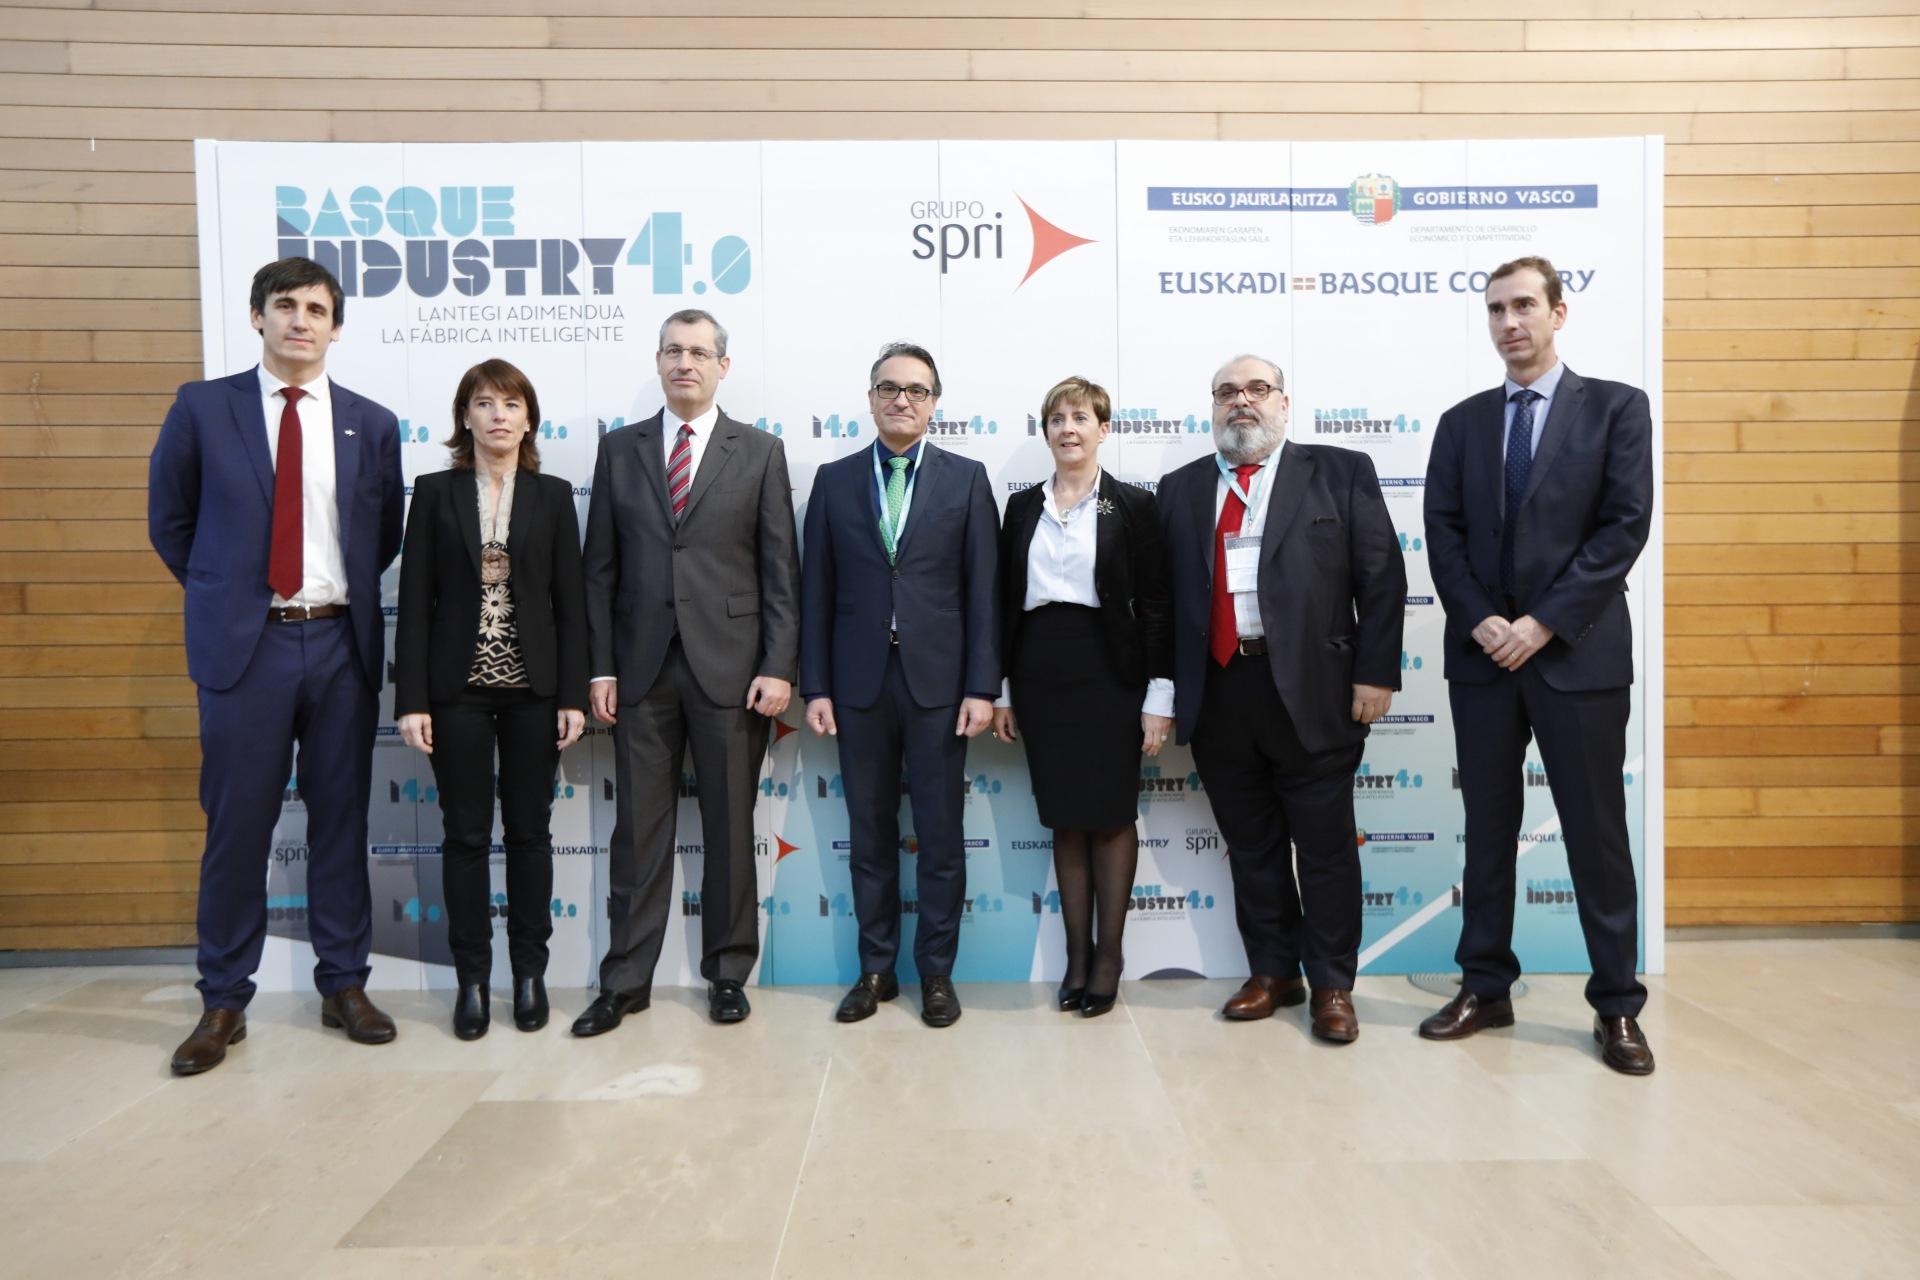 basque industry 2